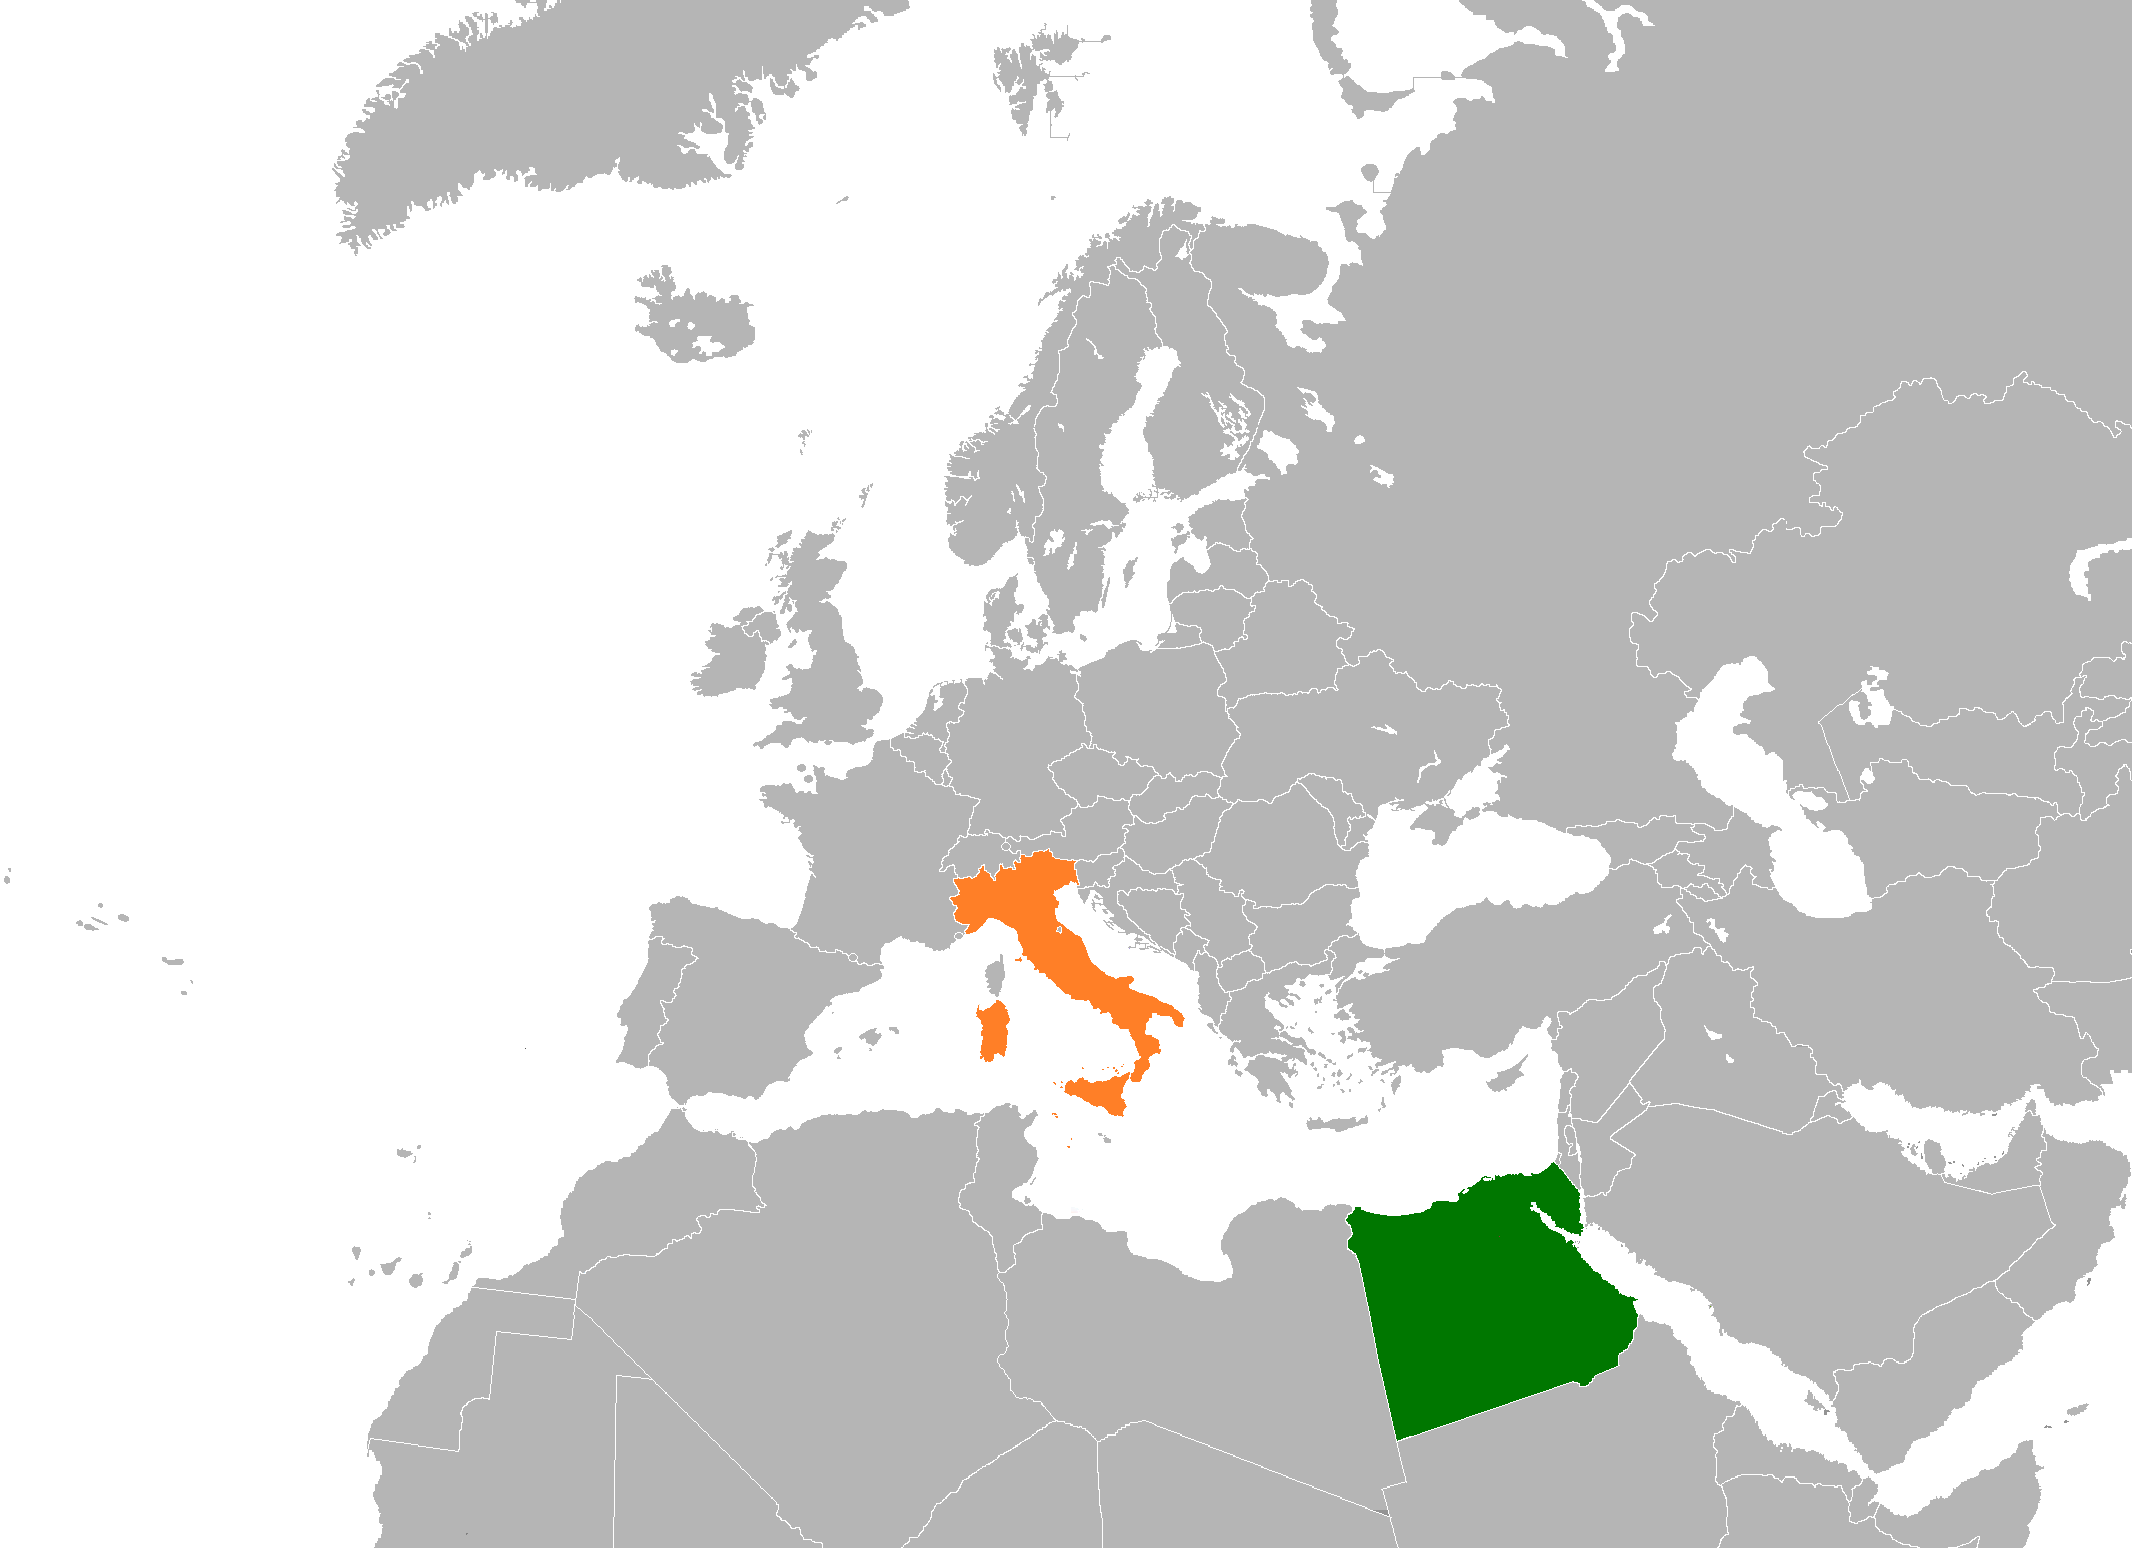 Cartina Egitto In Italiano.File Italy Egypt Locator Png Wikimedia Commons